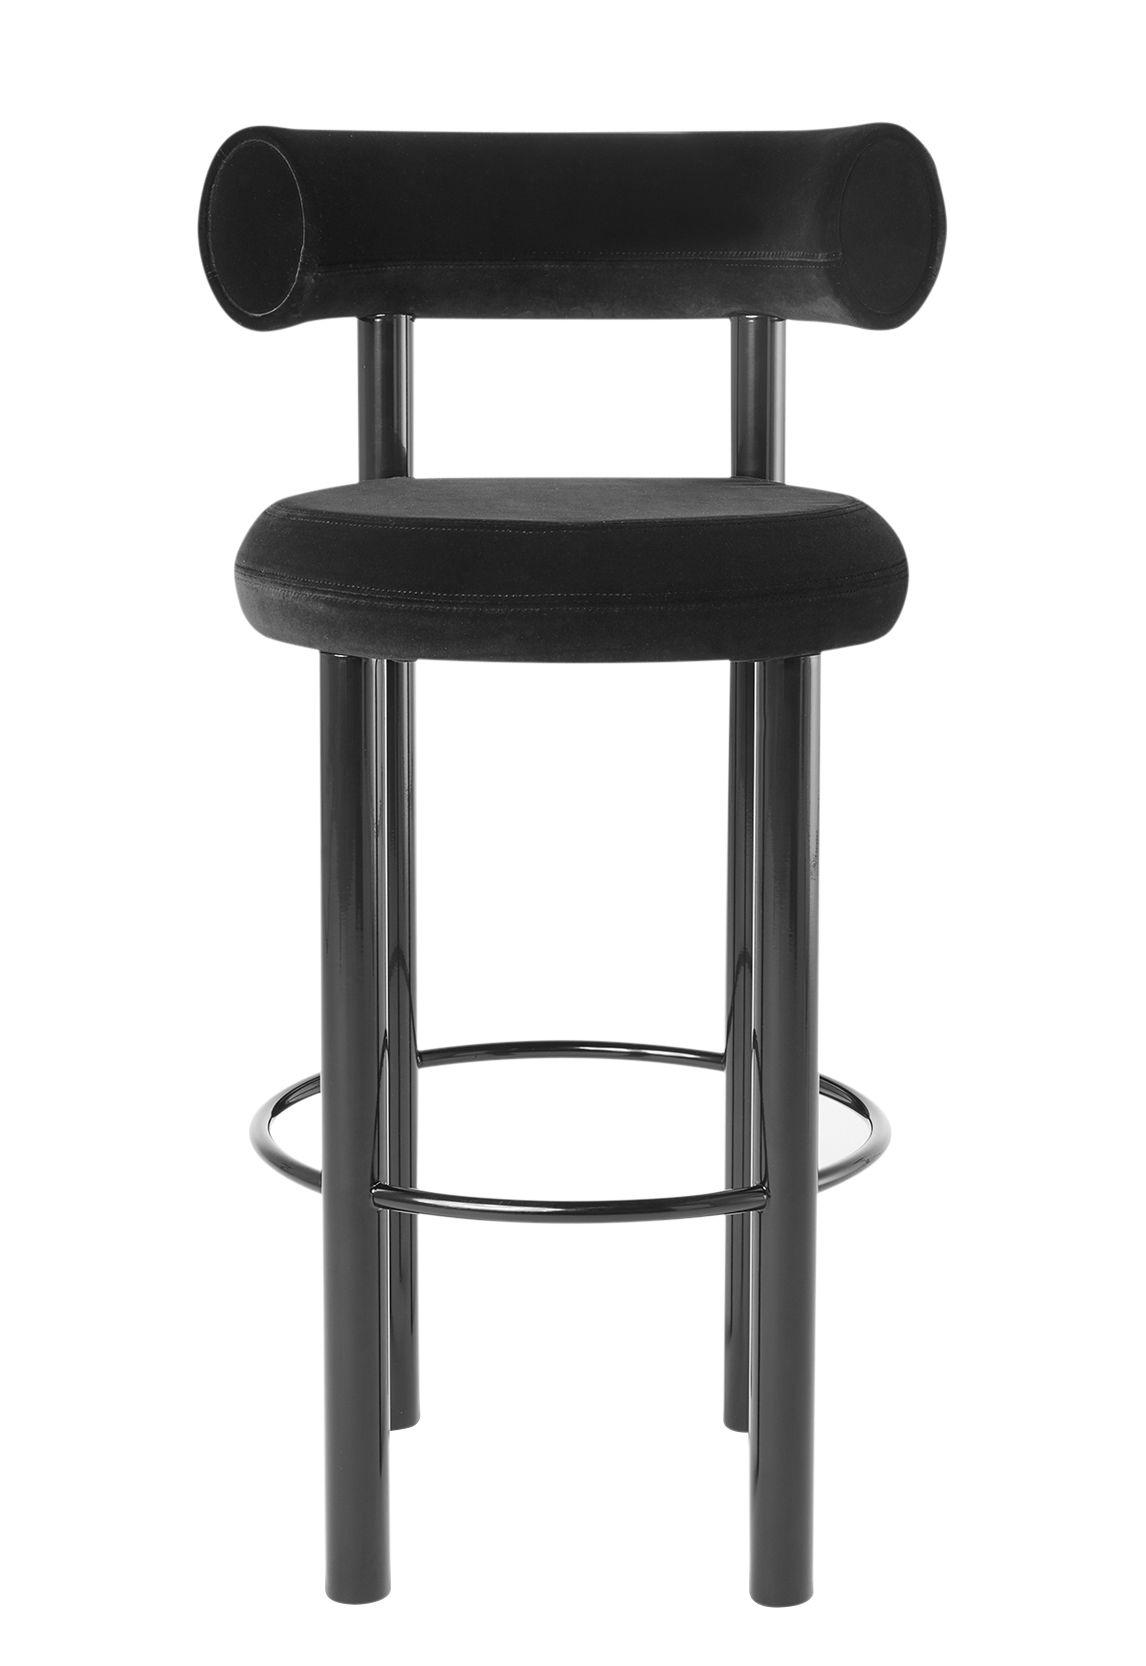 Furniture - Bar Stools - Fat Bar chair - / Velvet - H 75 cm by Tom Dixon - Black - Lacquered steel, Moulded foam, Velvet